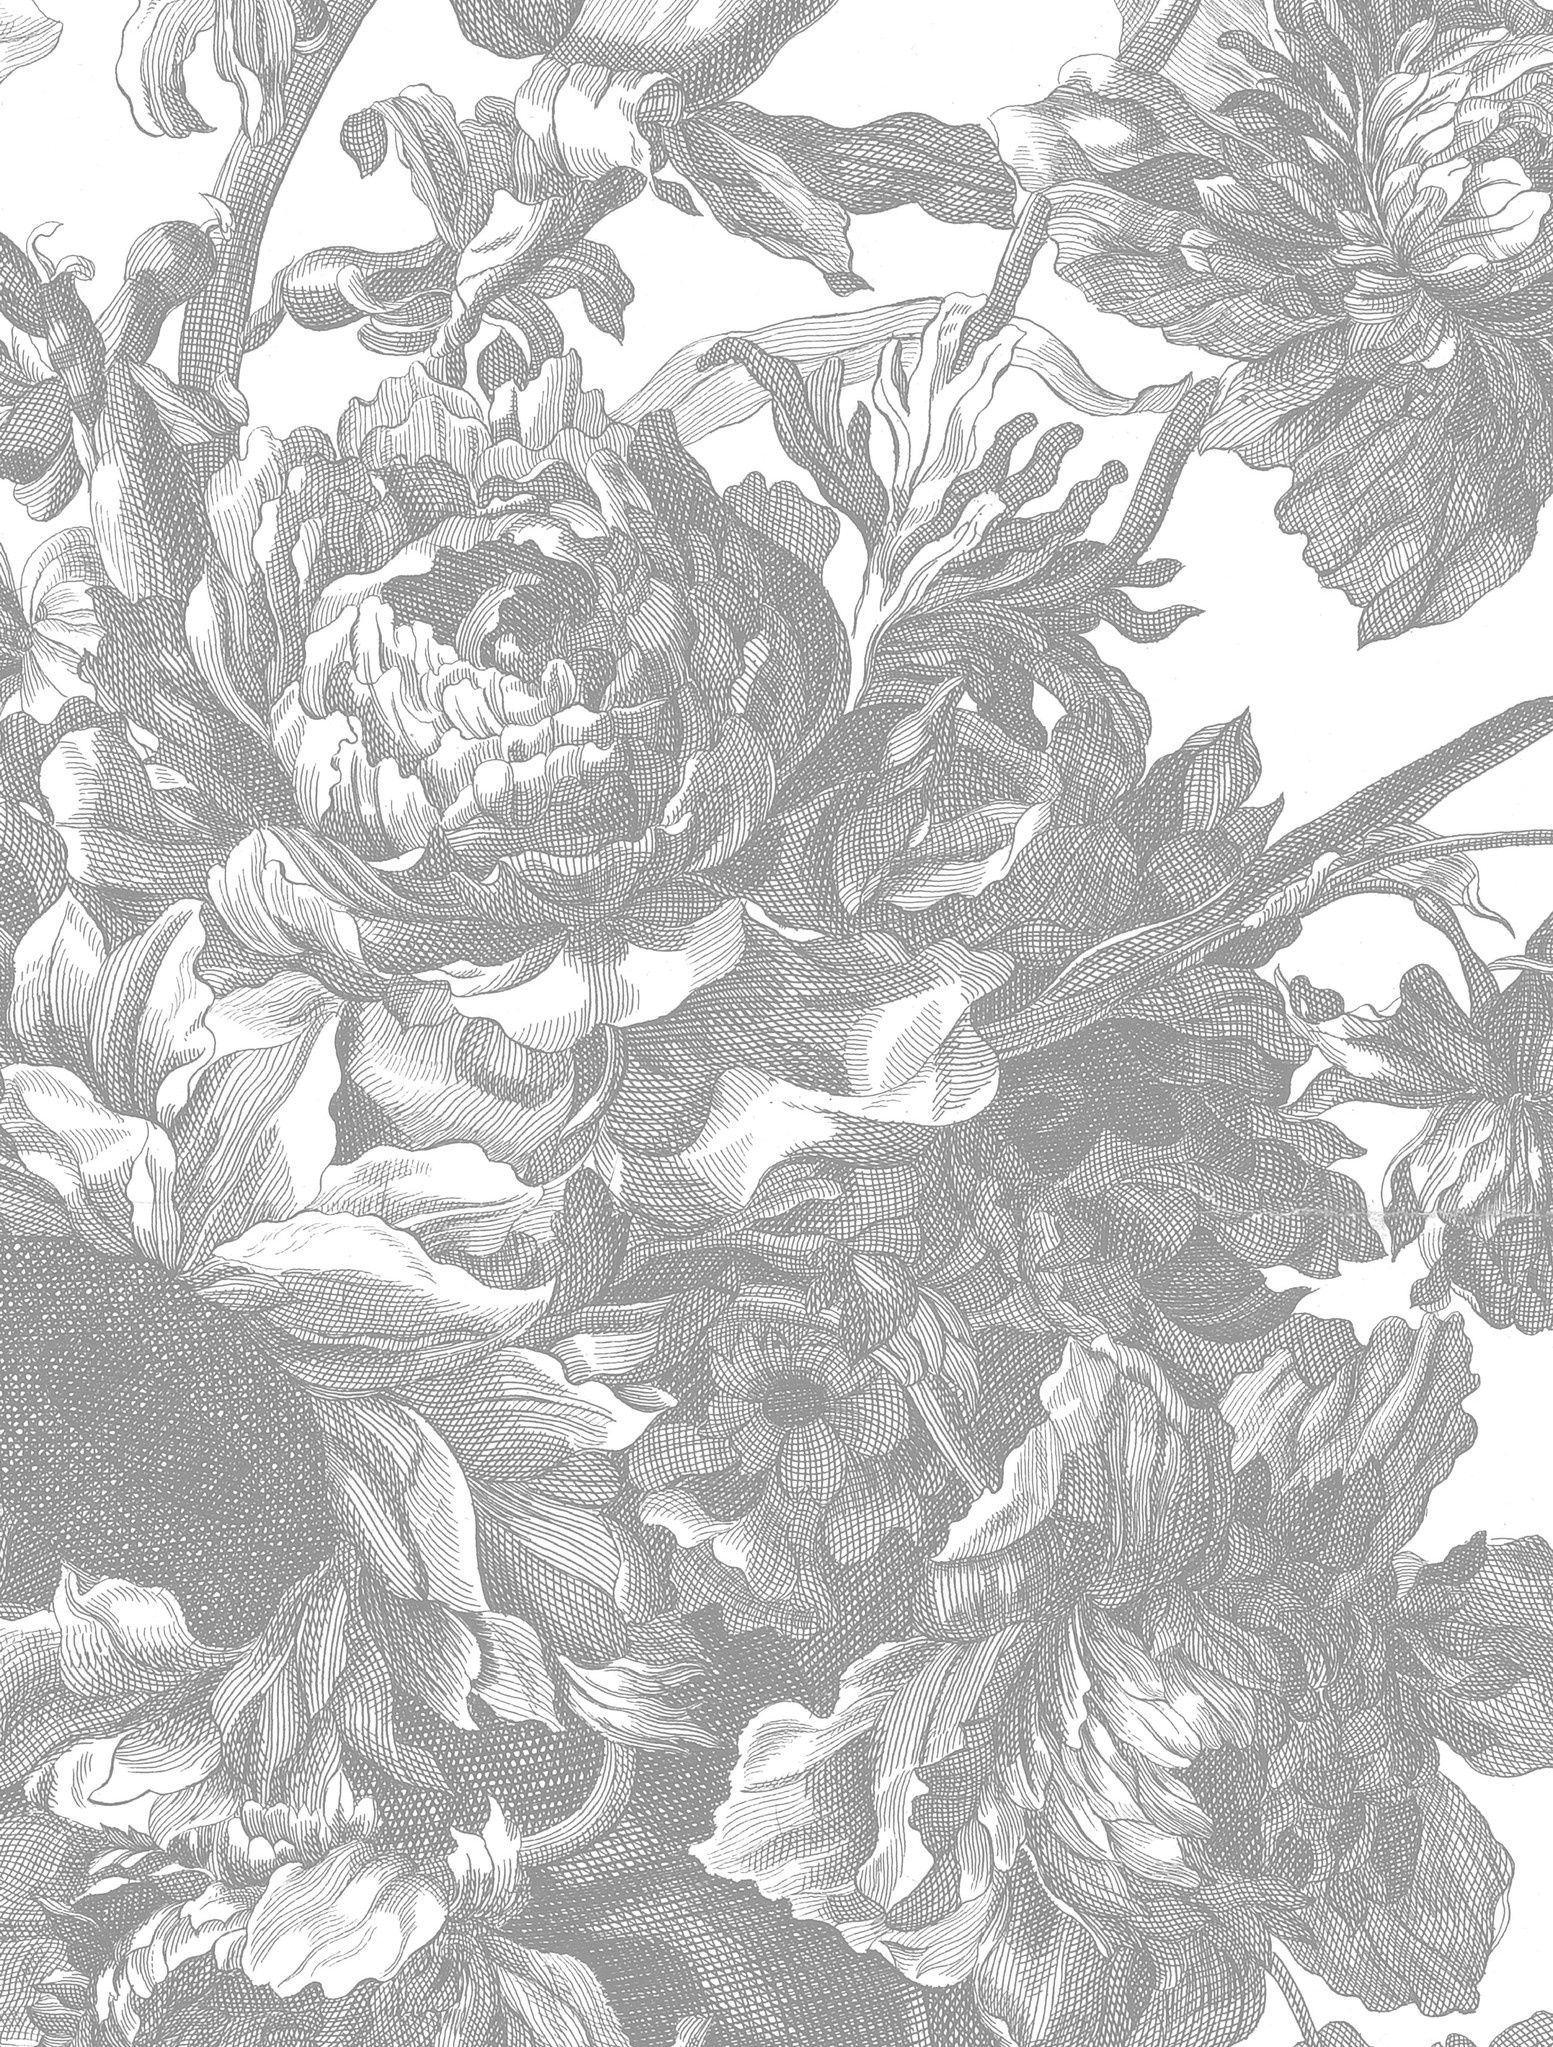 Behang Engraved Flowers 142.5x180cm-4